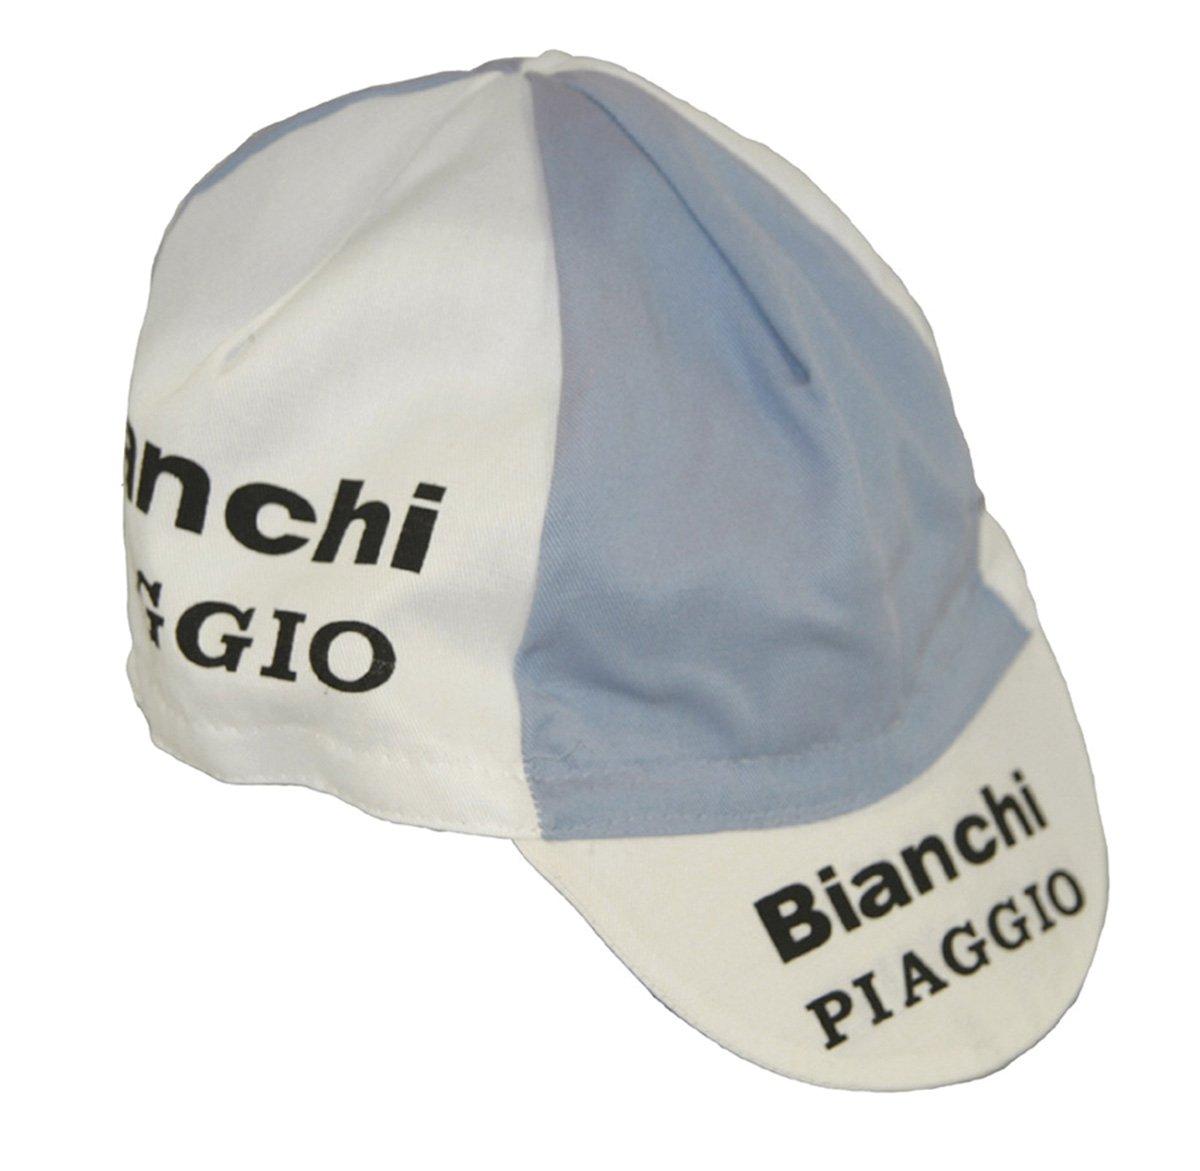 Bella Capo Retro Cap, Bianchi Aardvark T007DR.01BIANCHI